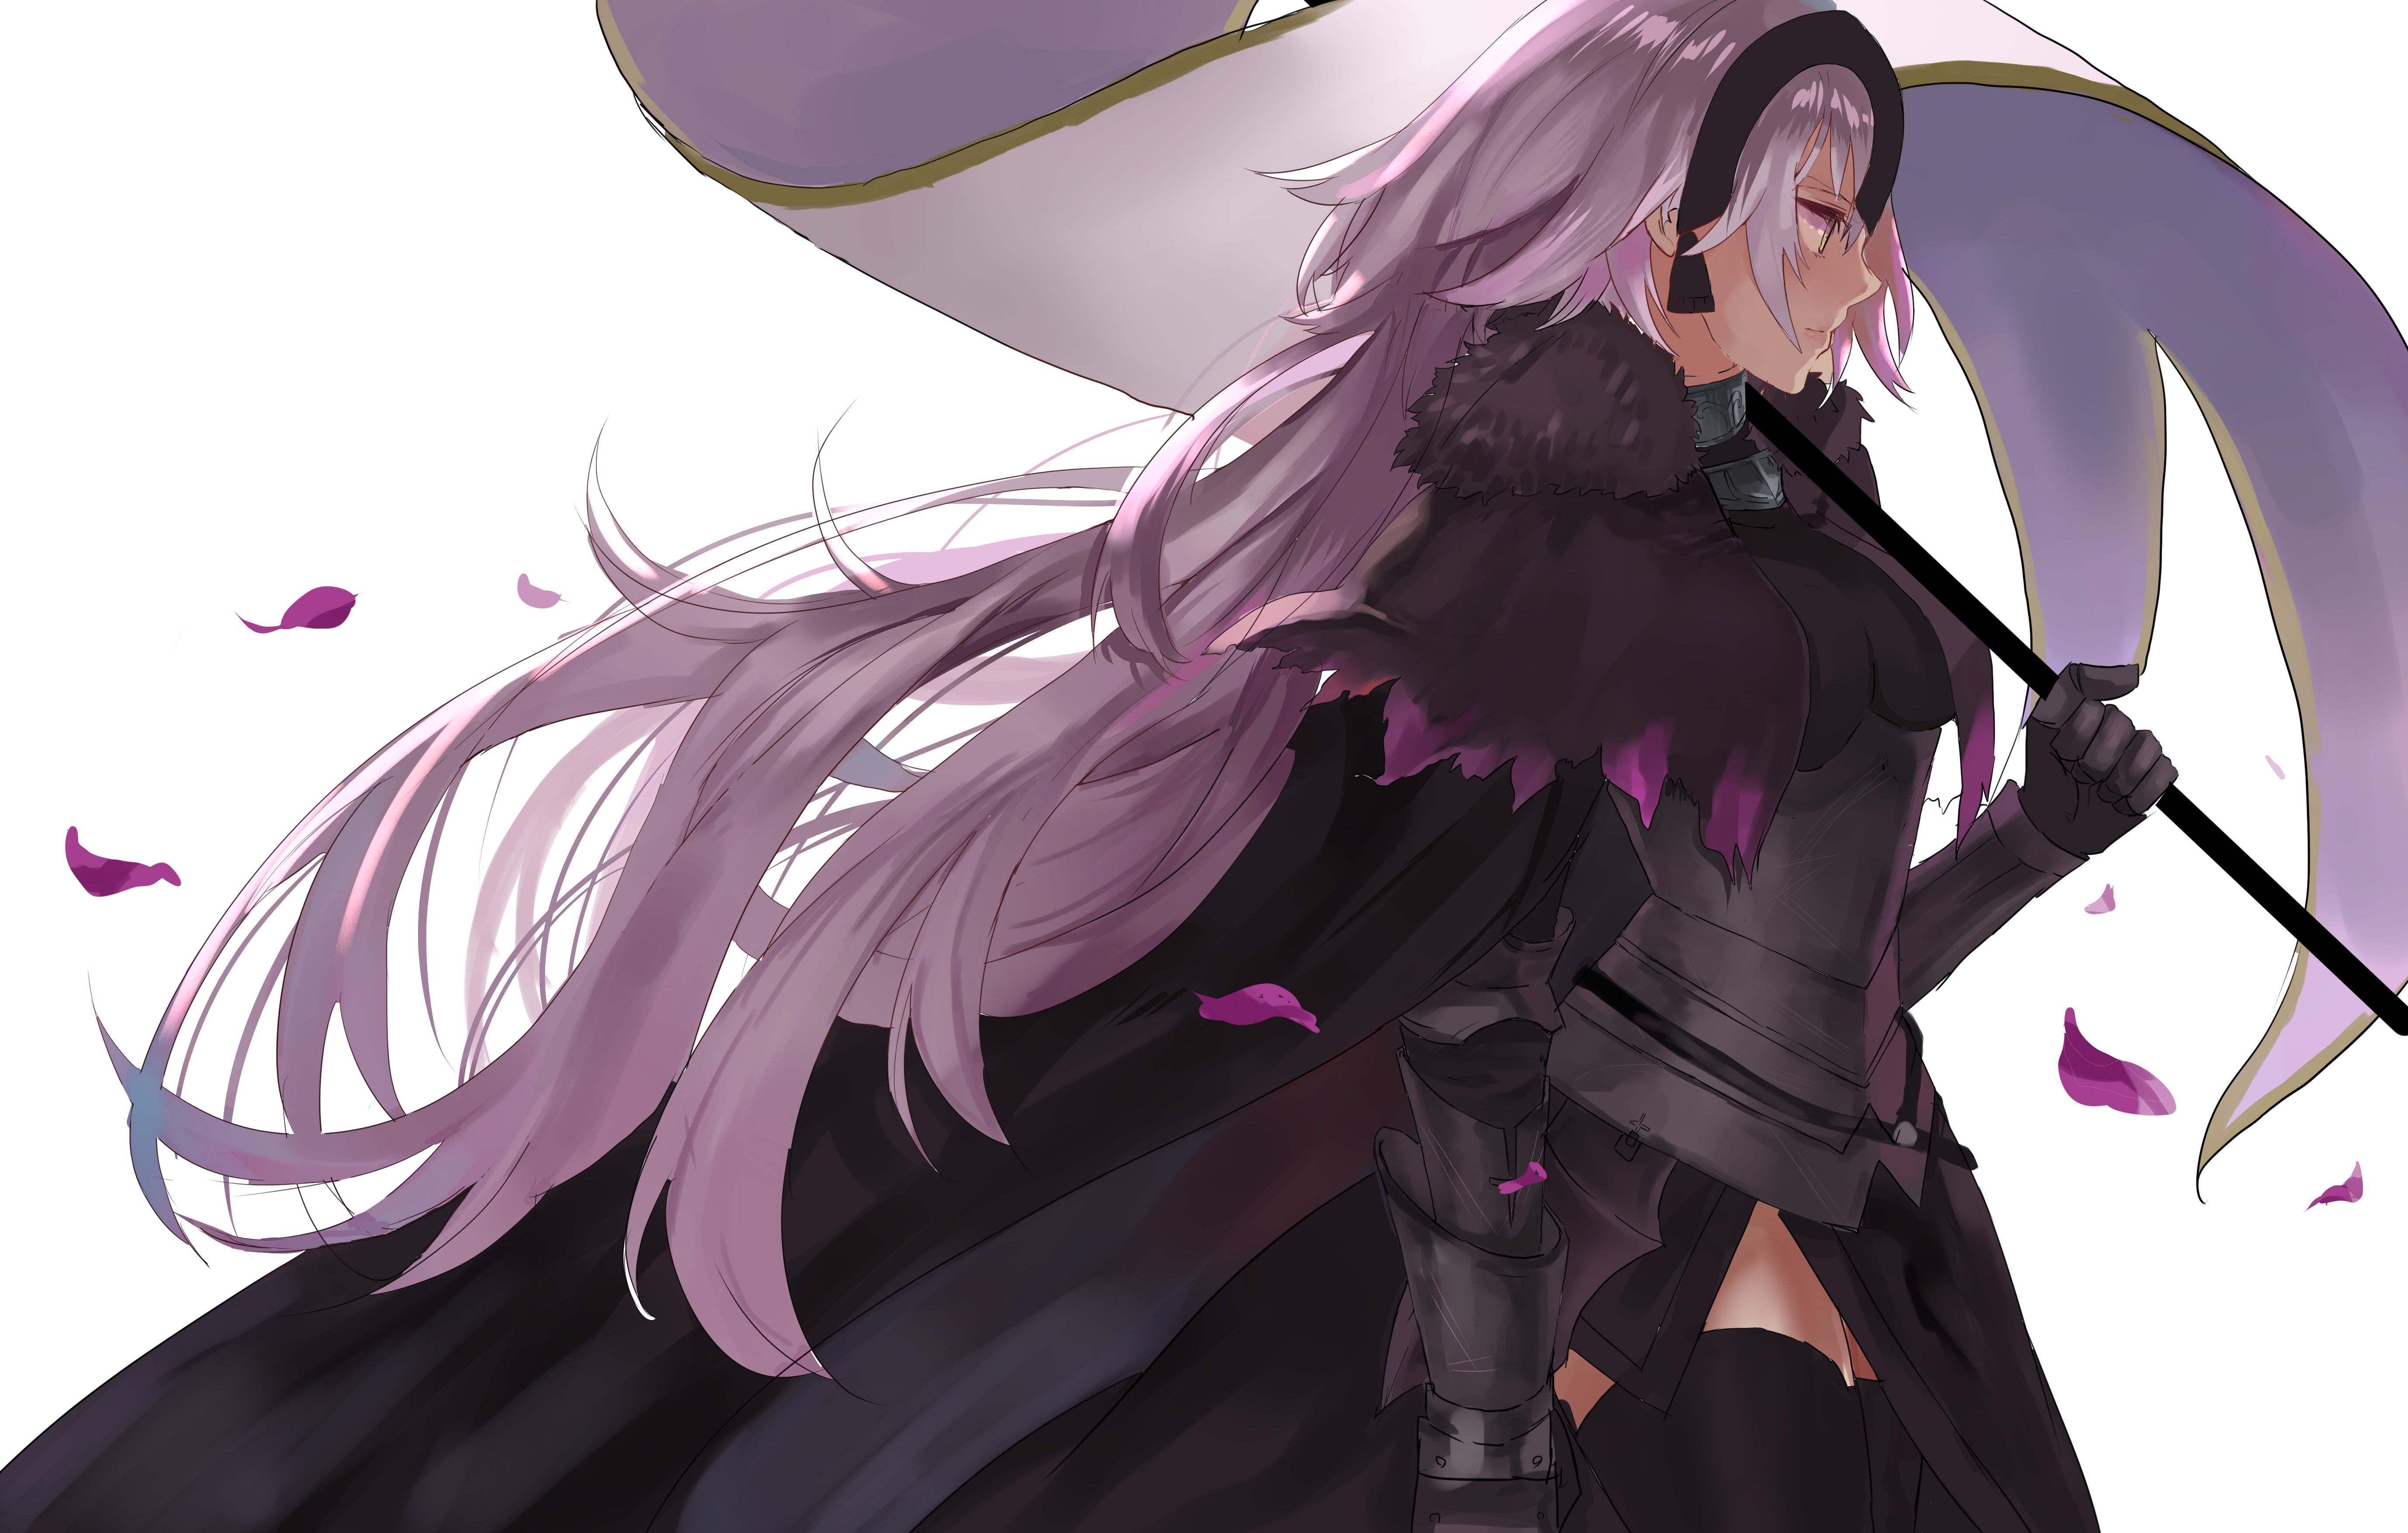 Avenger Jeanne D Arc Alter ジャンヌダルク オルタ フェイト